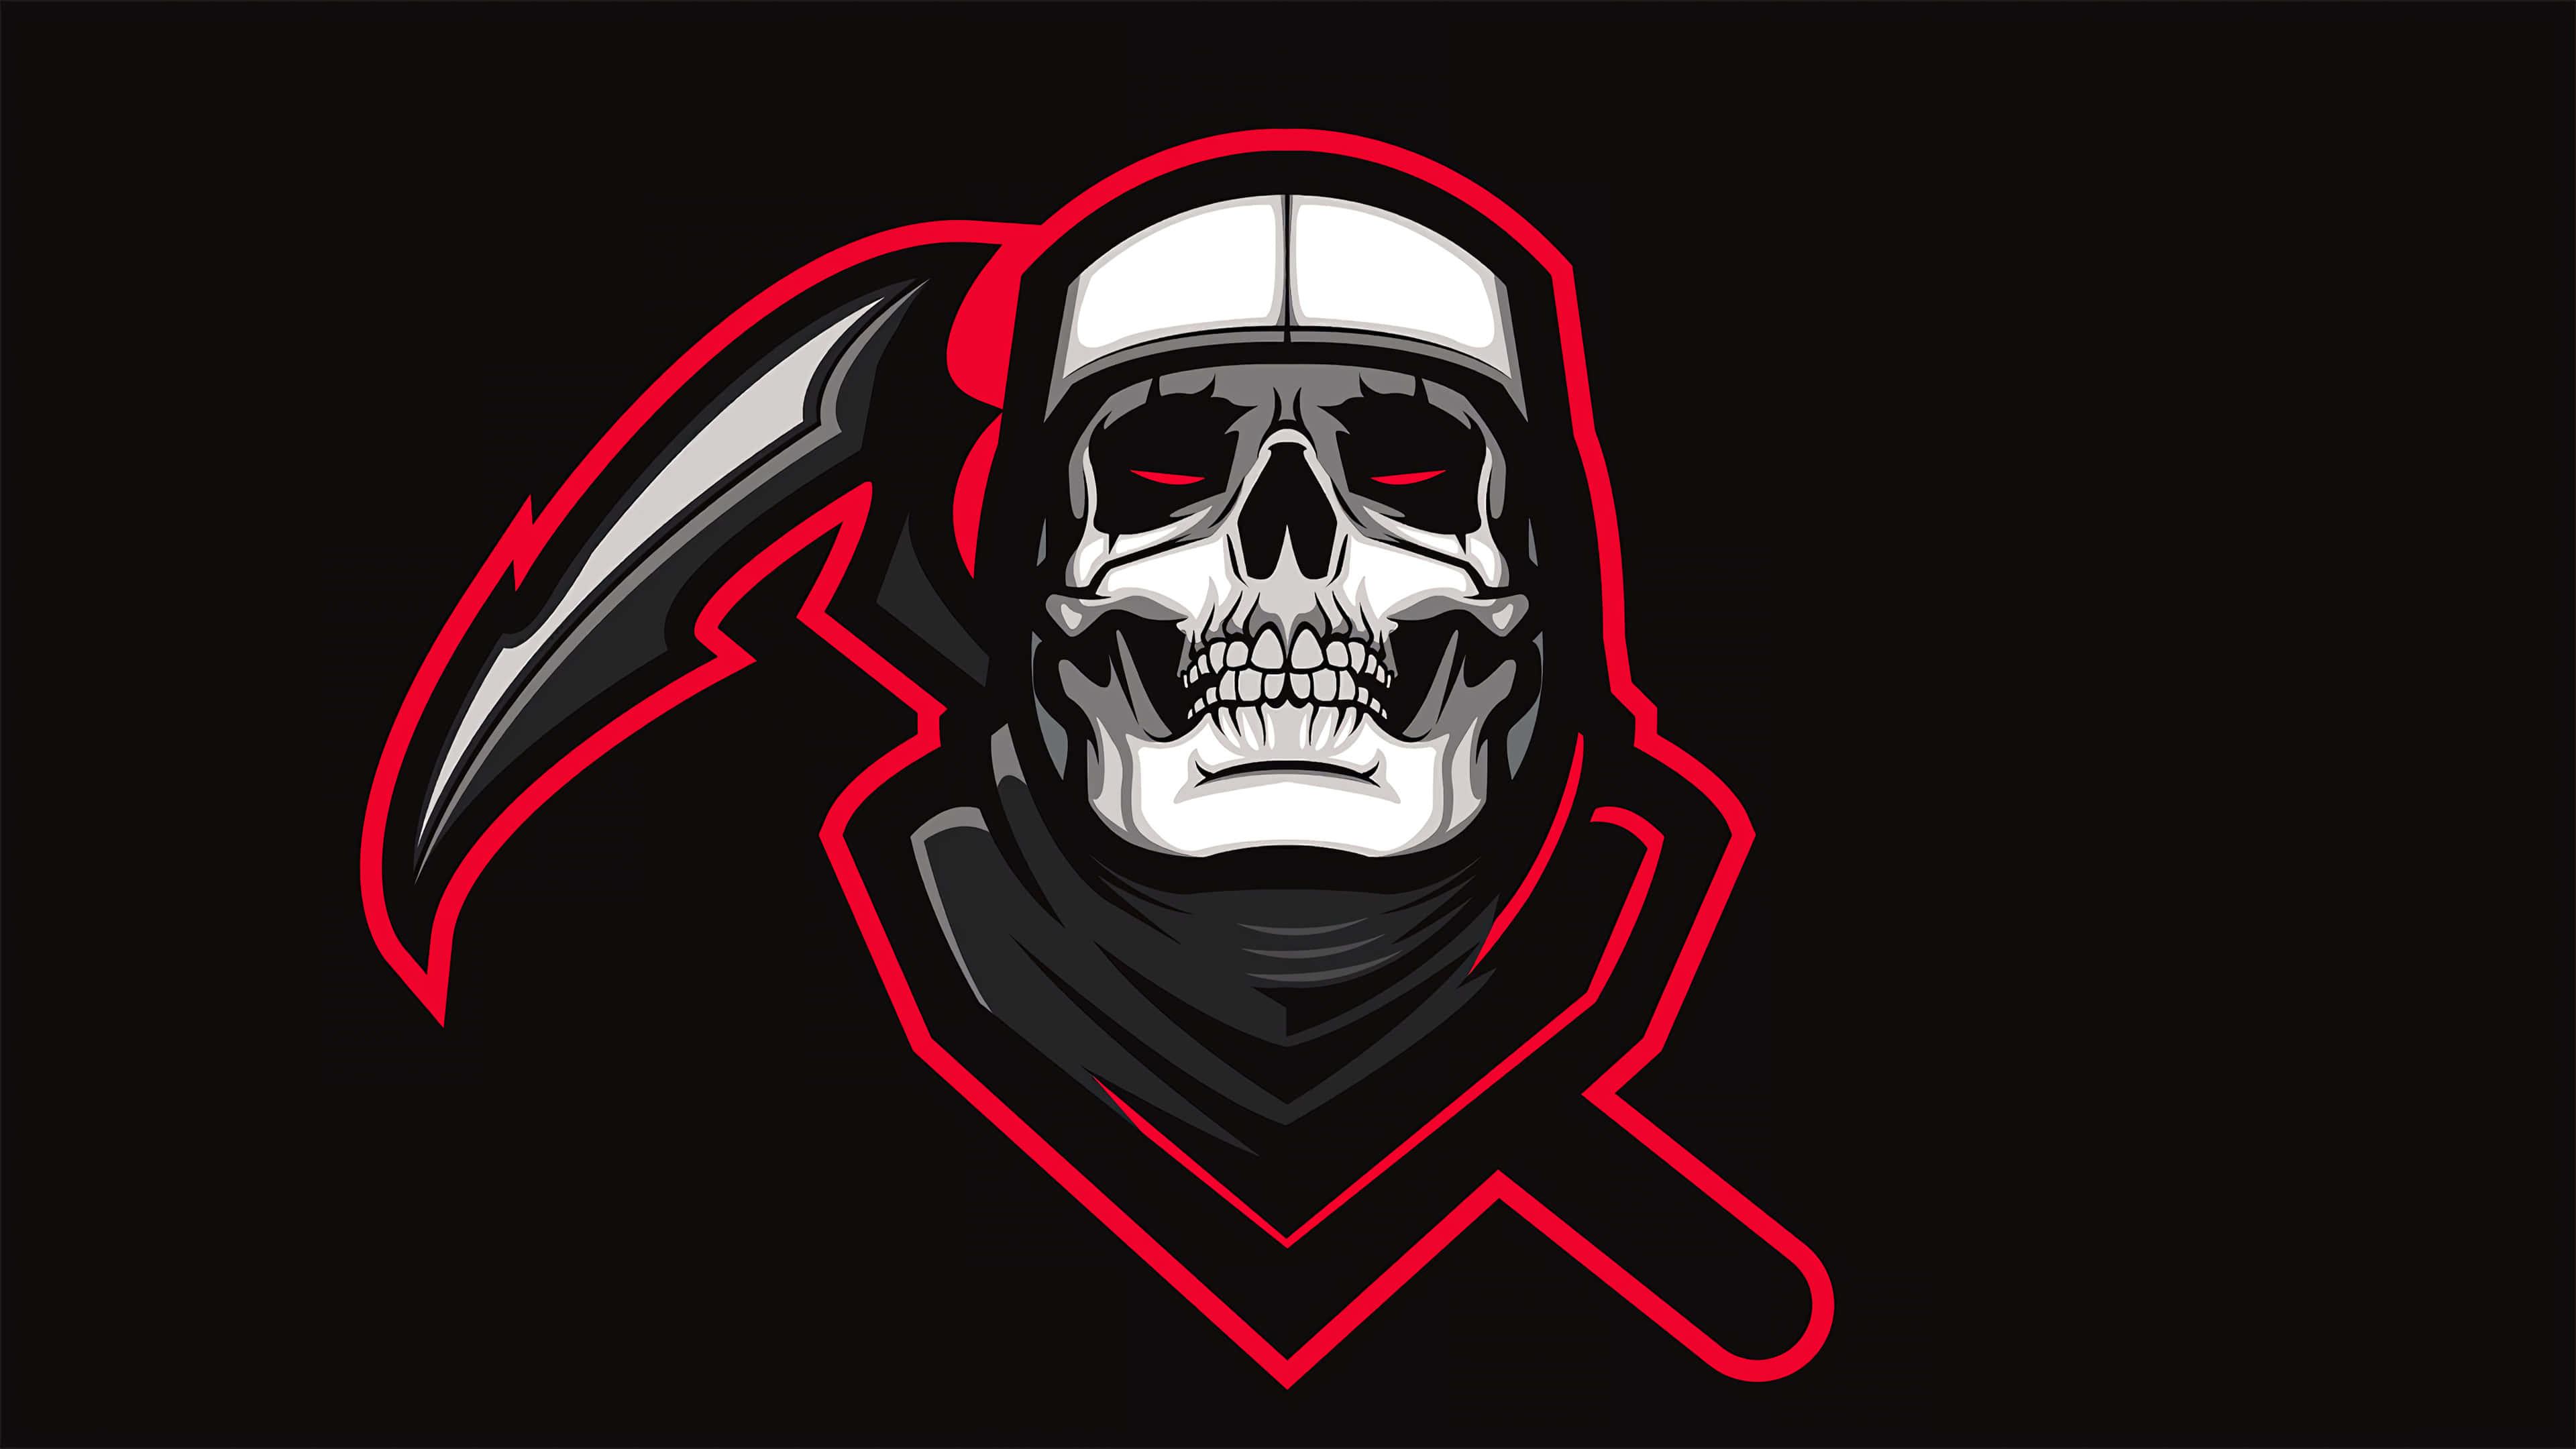 Fortnite Loading Screen Skull Reaper Uhd 4k Wallpaper Fortnite Skull Reaper Loading Screen 3840x2160 Download Hd Wallpaper Wallpapertip